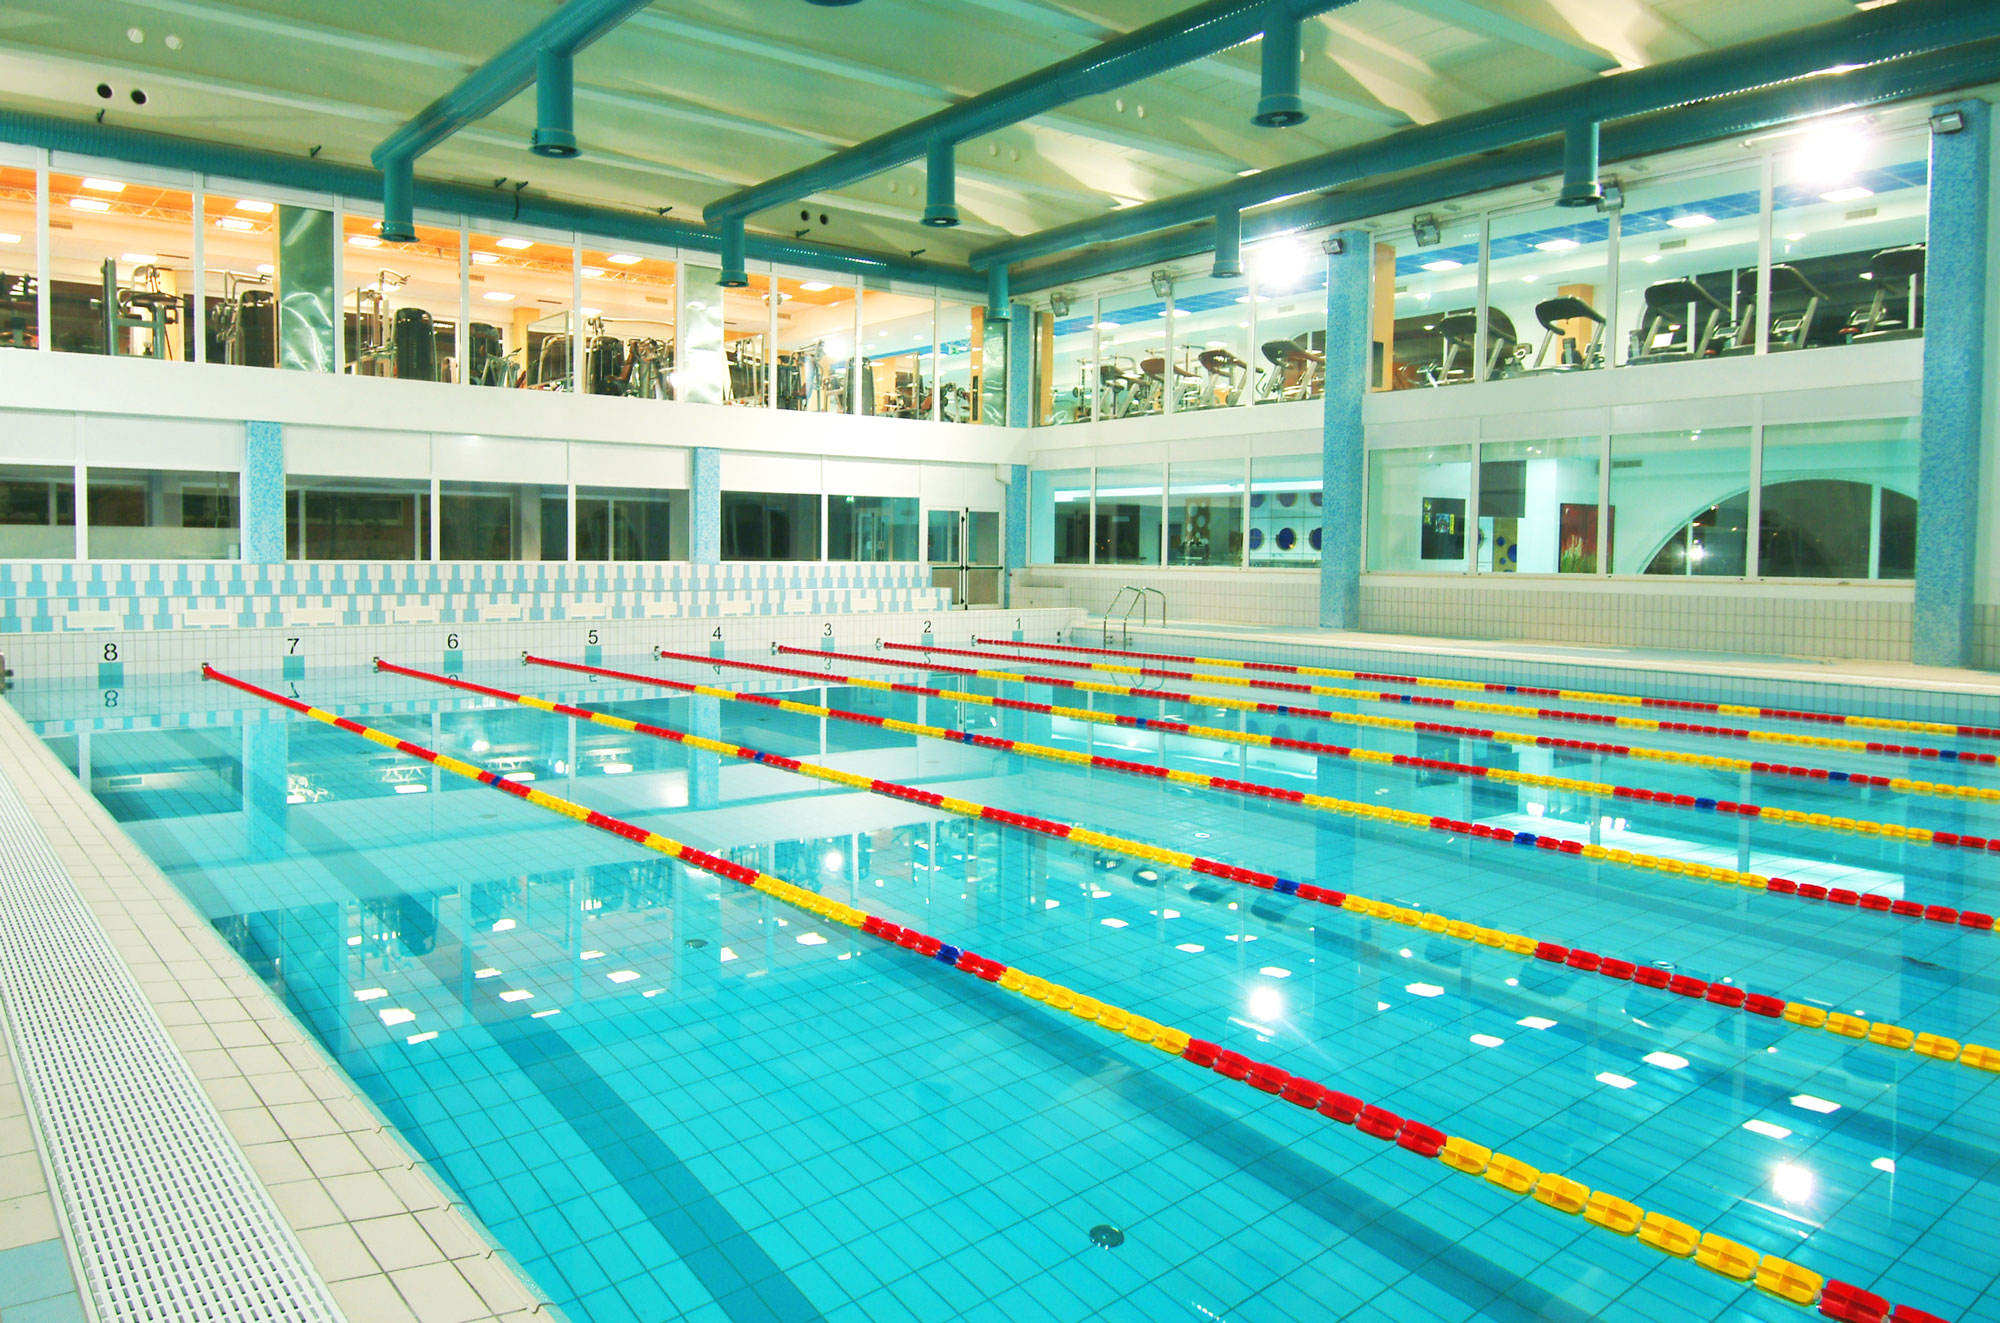 Piscina countrysport avellino - Dimensioni piscina olimpionica ...